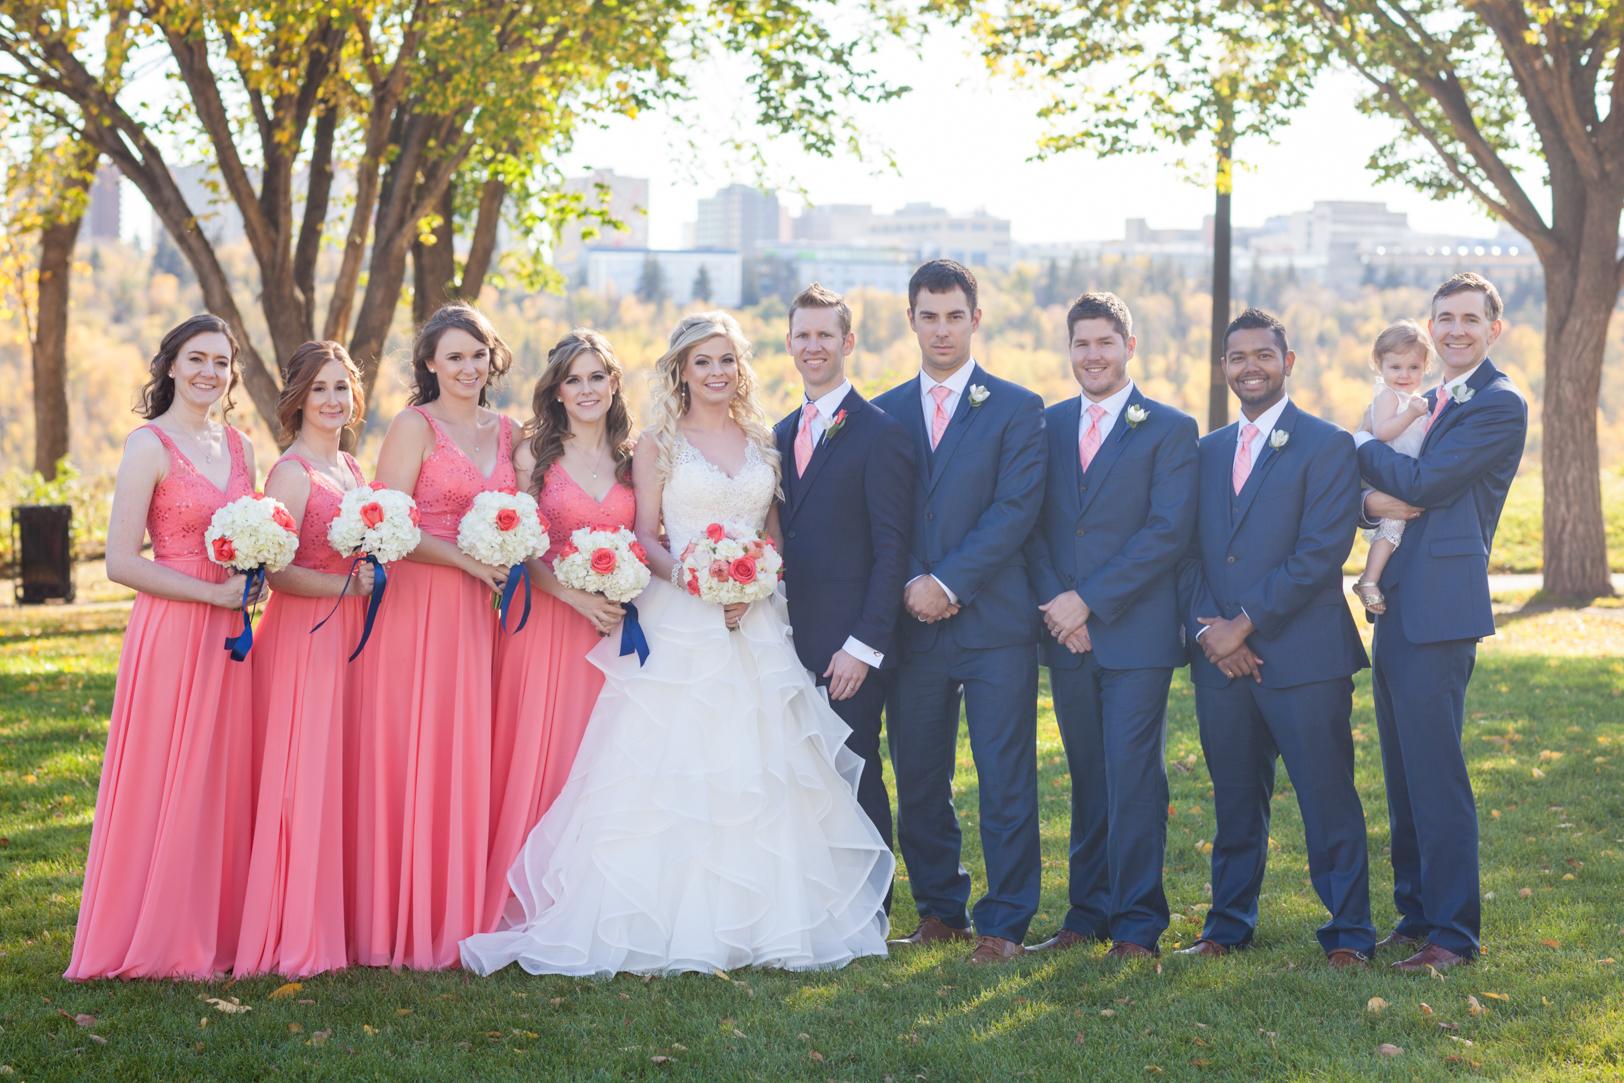 outdoor wedding photo locations edmonton